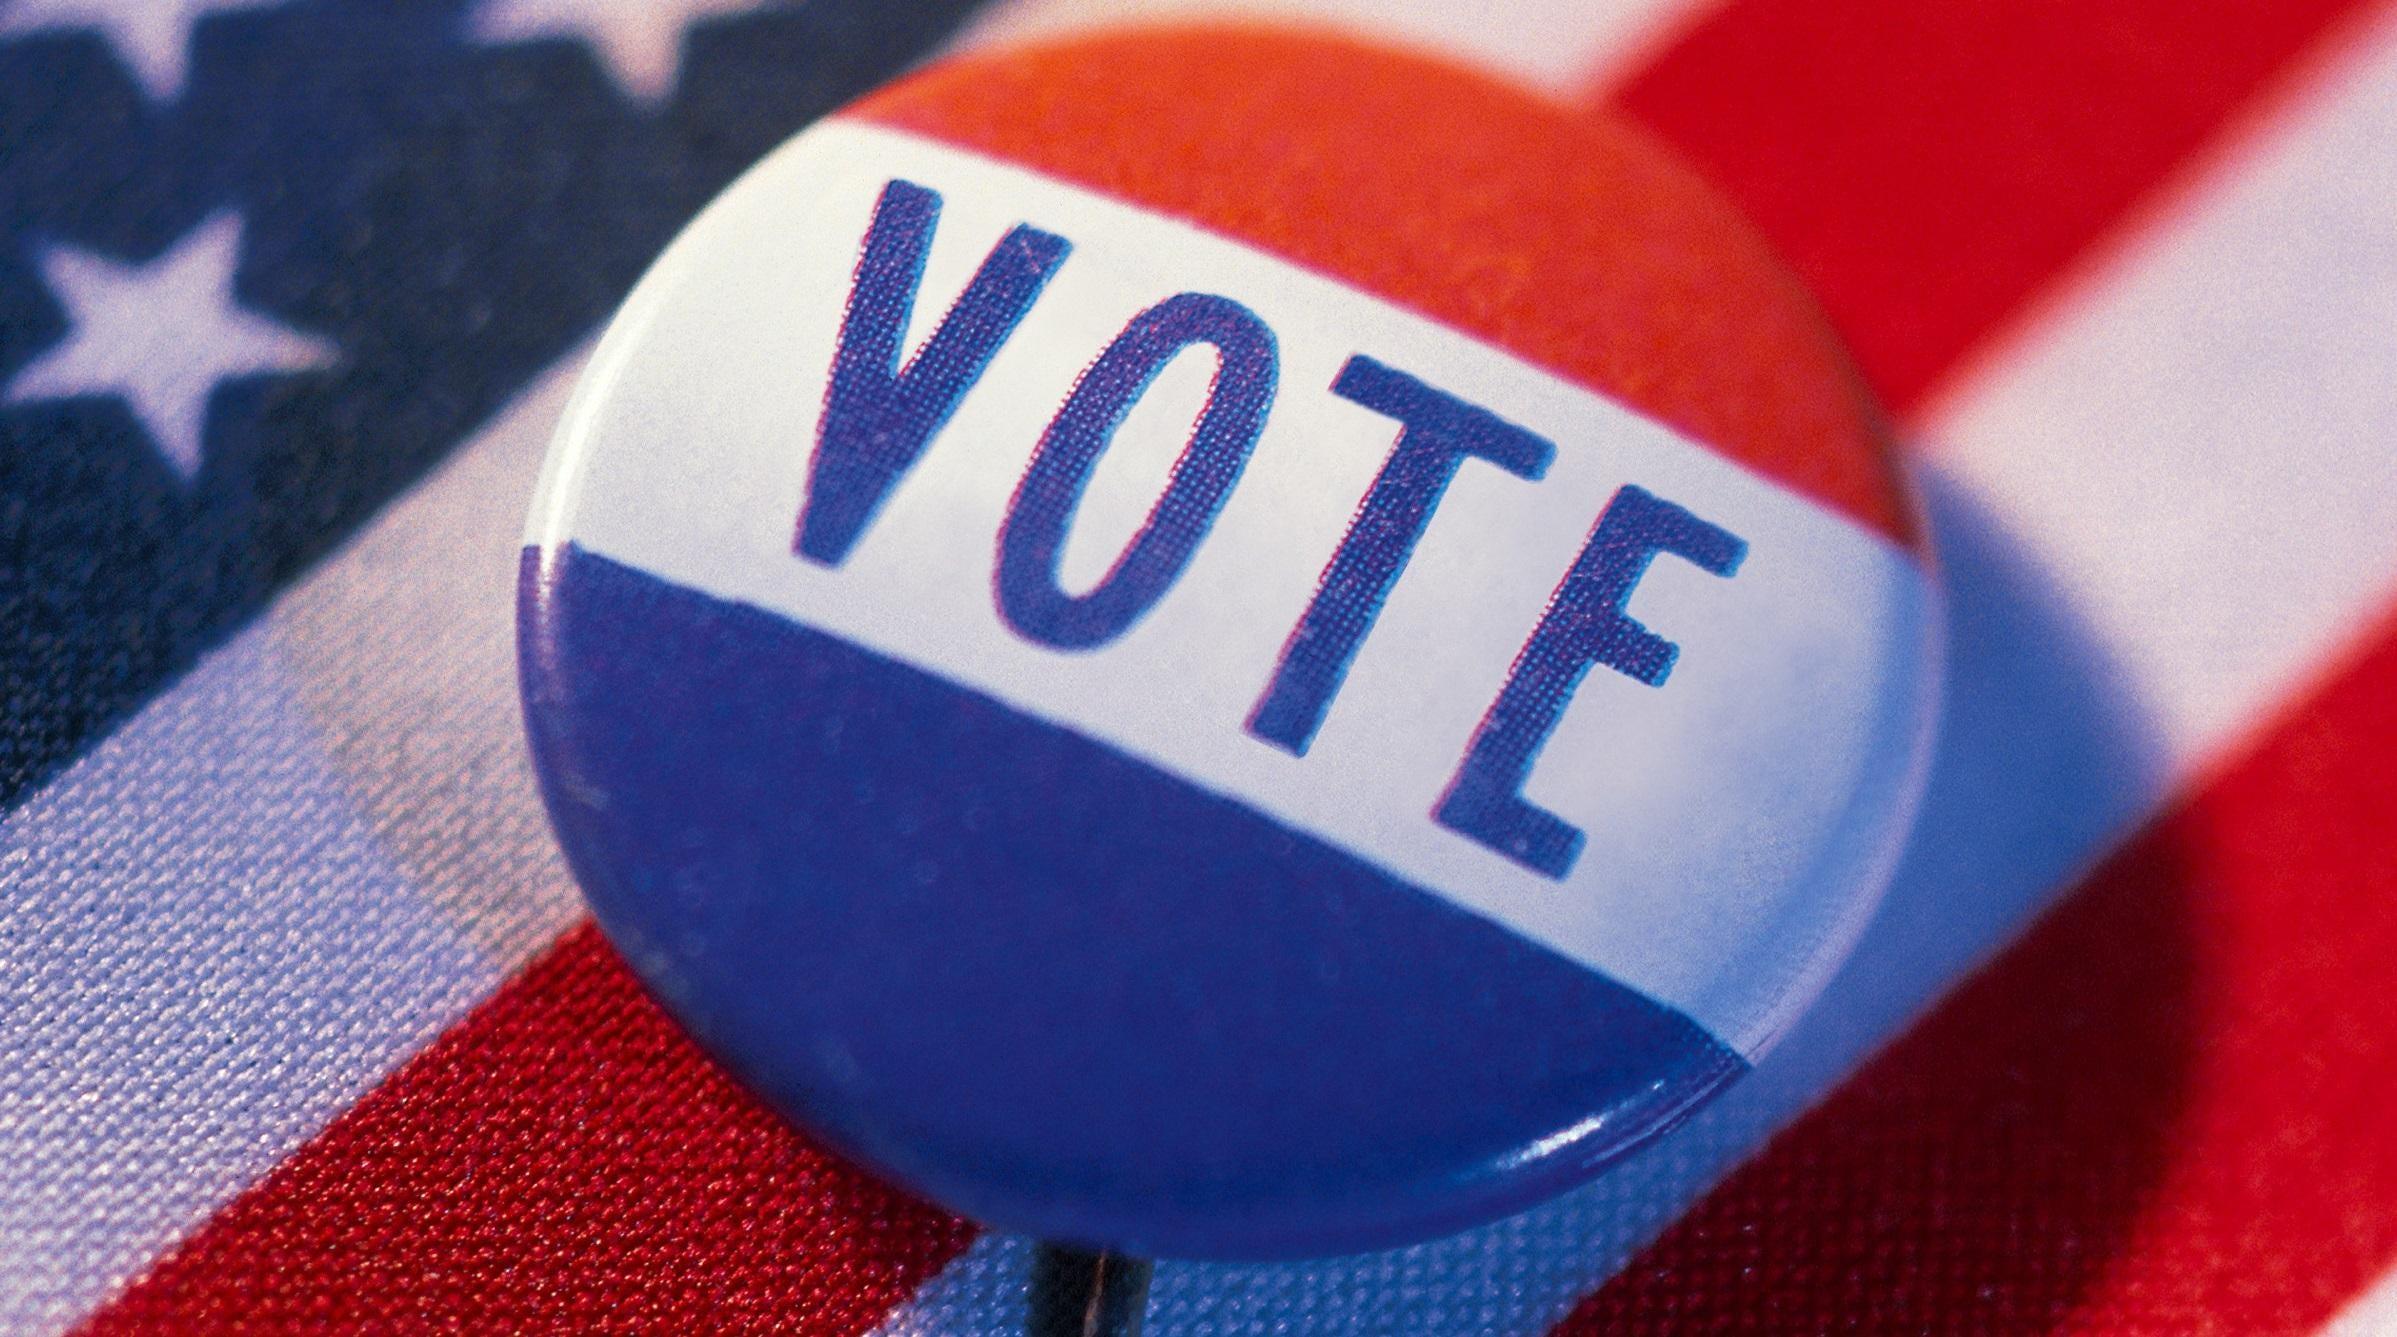 Nevada voter registration deadline is Thursday. Here are other dates & details | Reno Gazette Journal